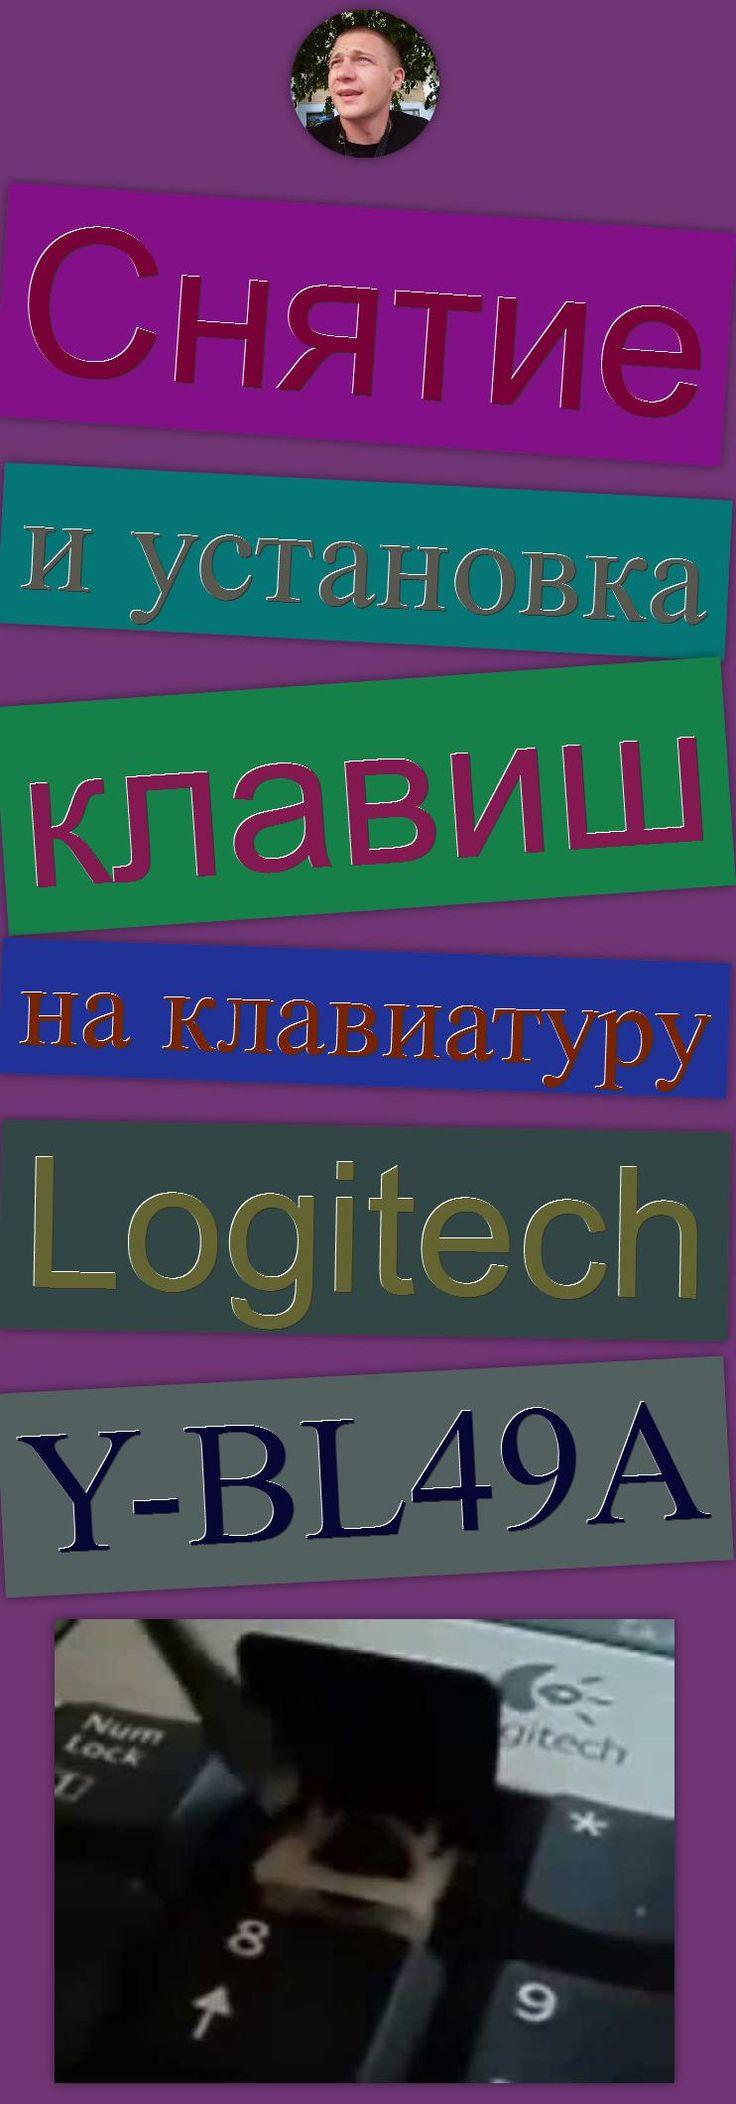 Снятие и установка клавиш на клавиатуру Logitech Y-BL49A клавишы, демонтаж клавиш, Racing Video Game (Video Game Genre), крепление клавиш, Toetsenbord, установка, монтаж клавиш, снятие, Logitech, ультра тонкие клавиши, Push-button